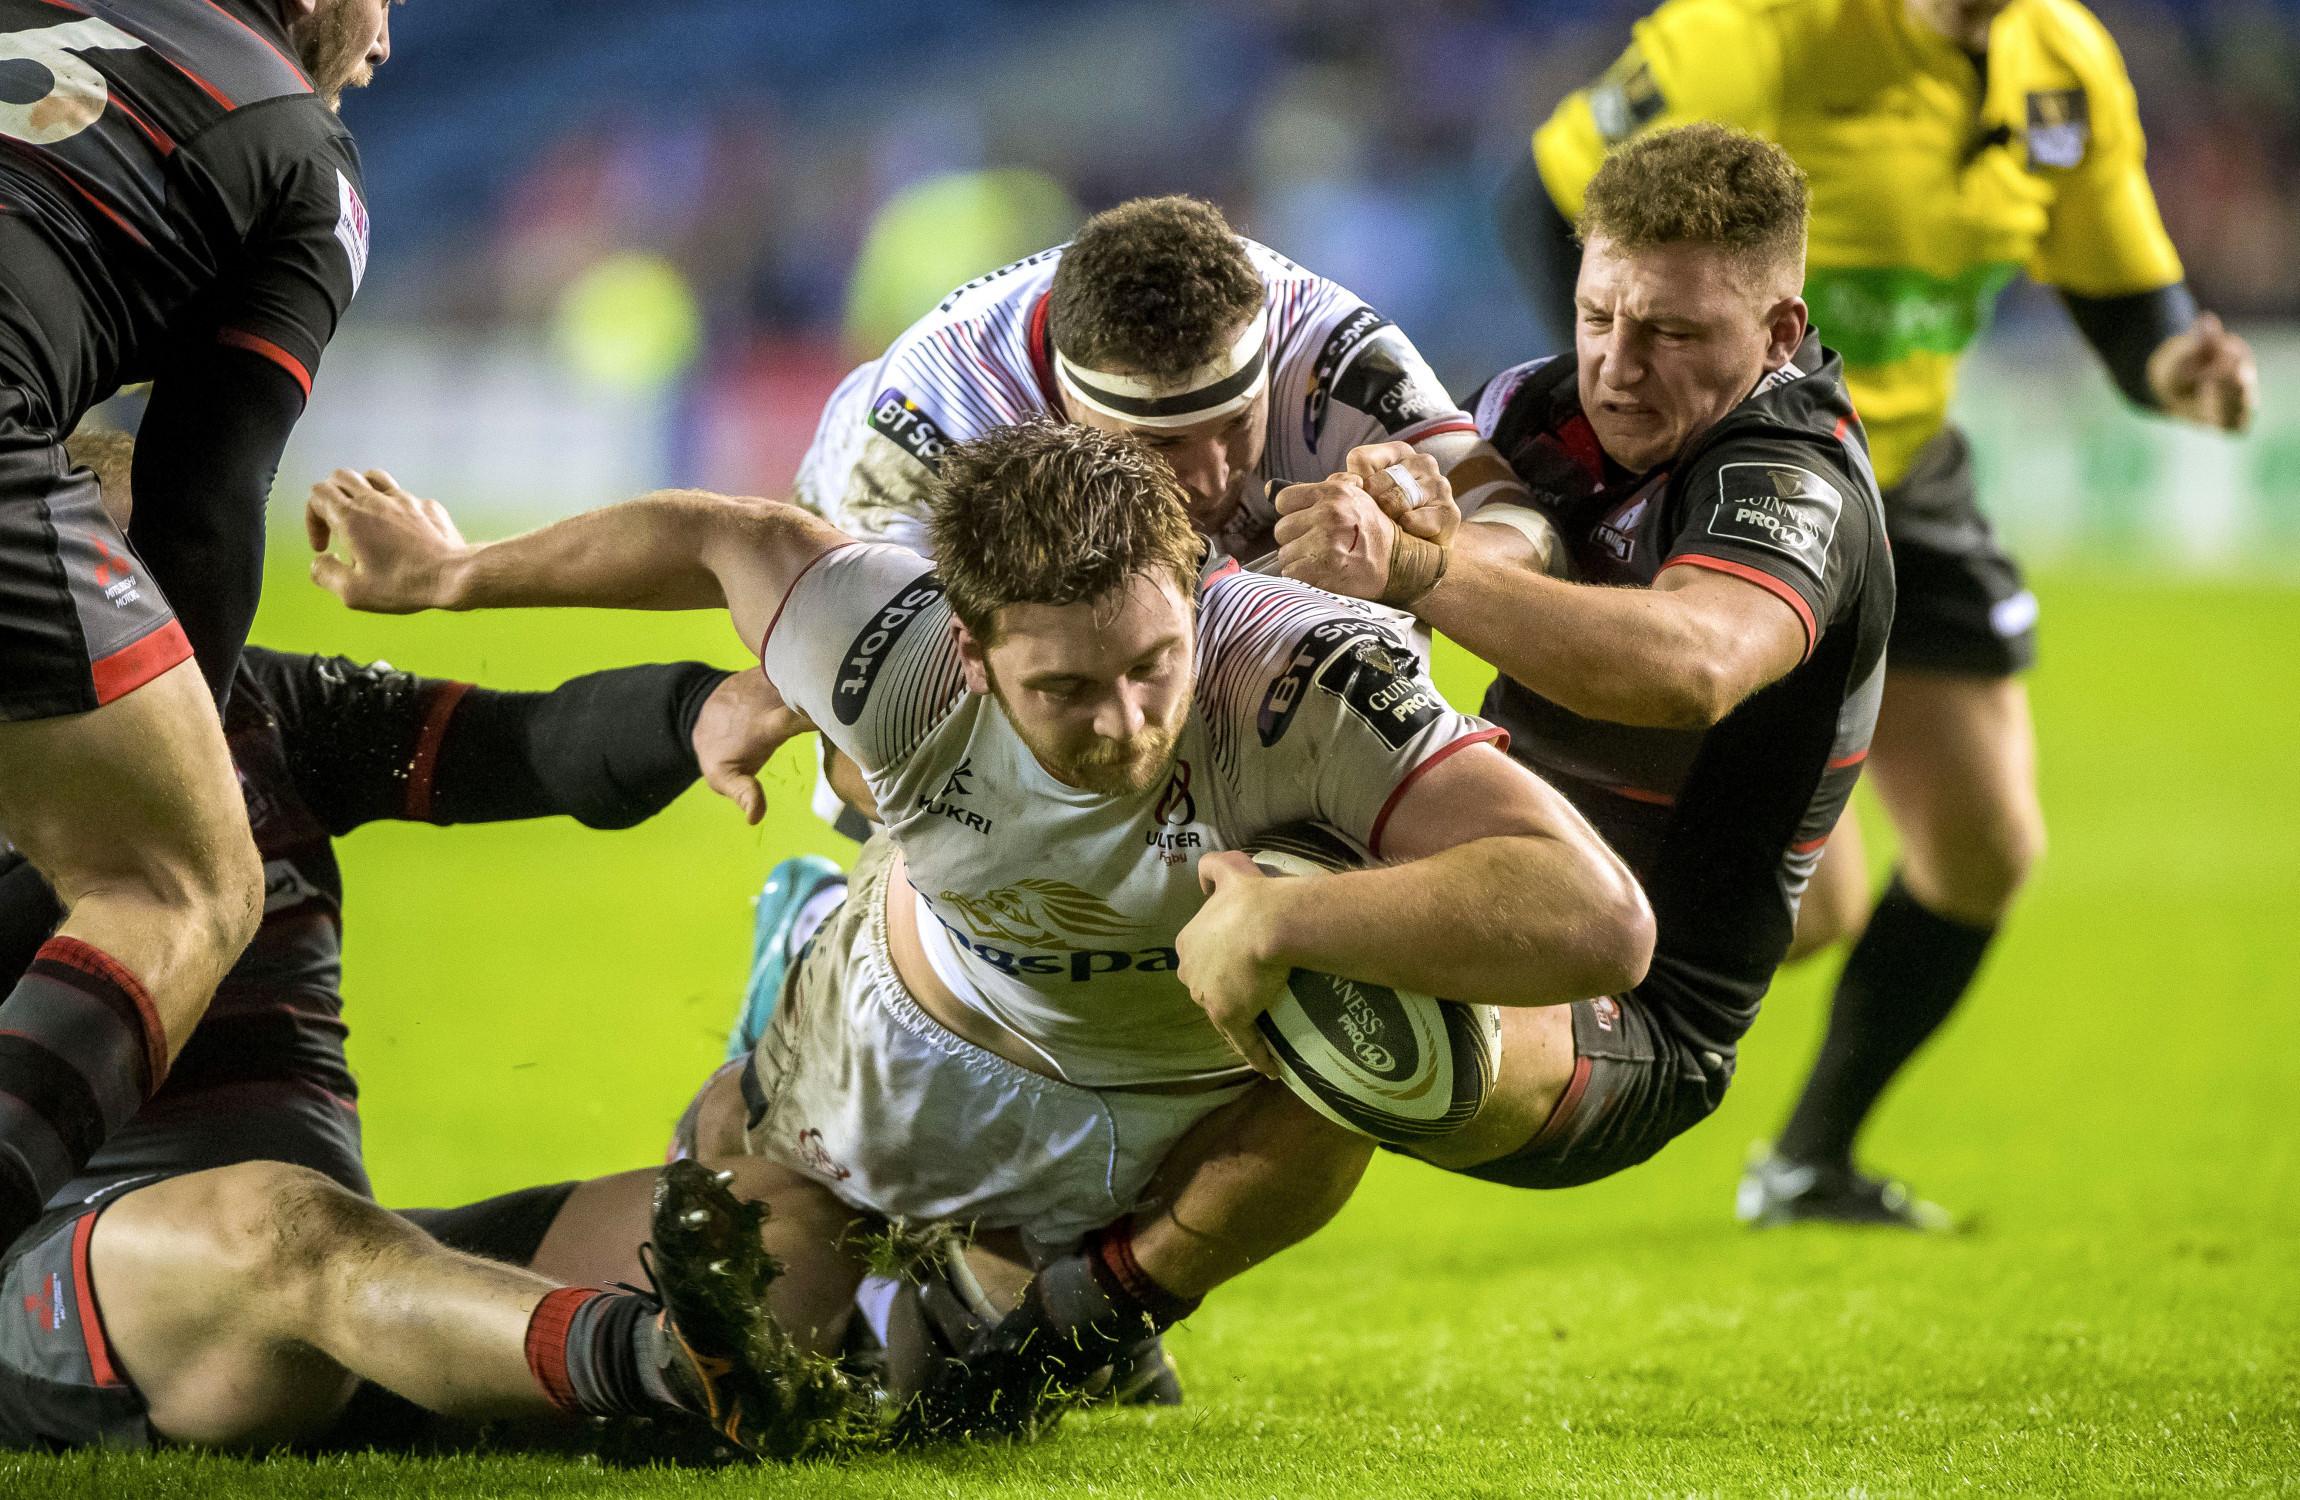 Ulster take bonus point win over Edinburgh